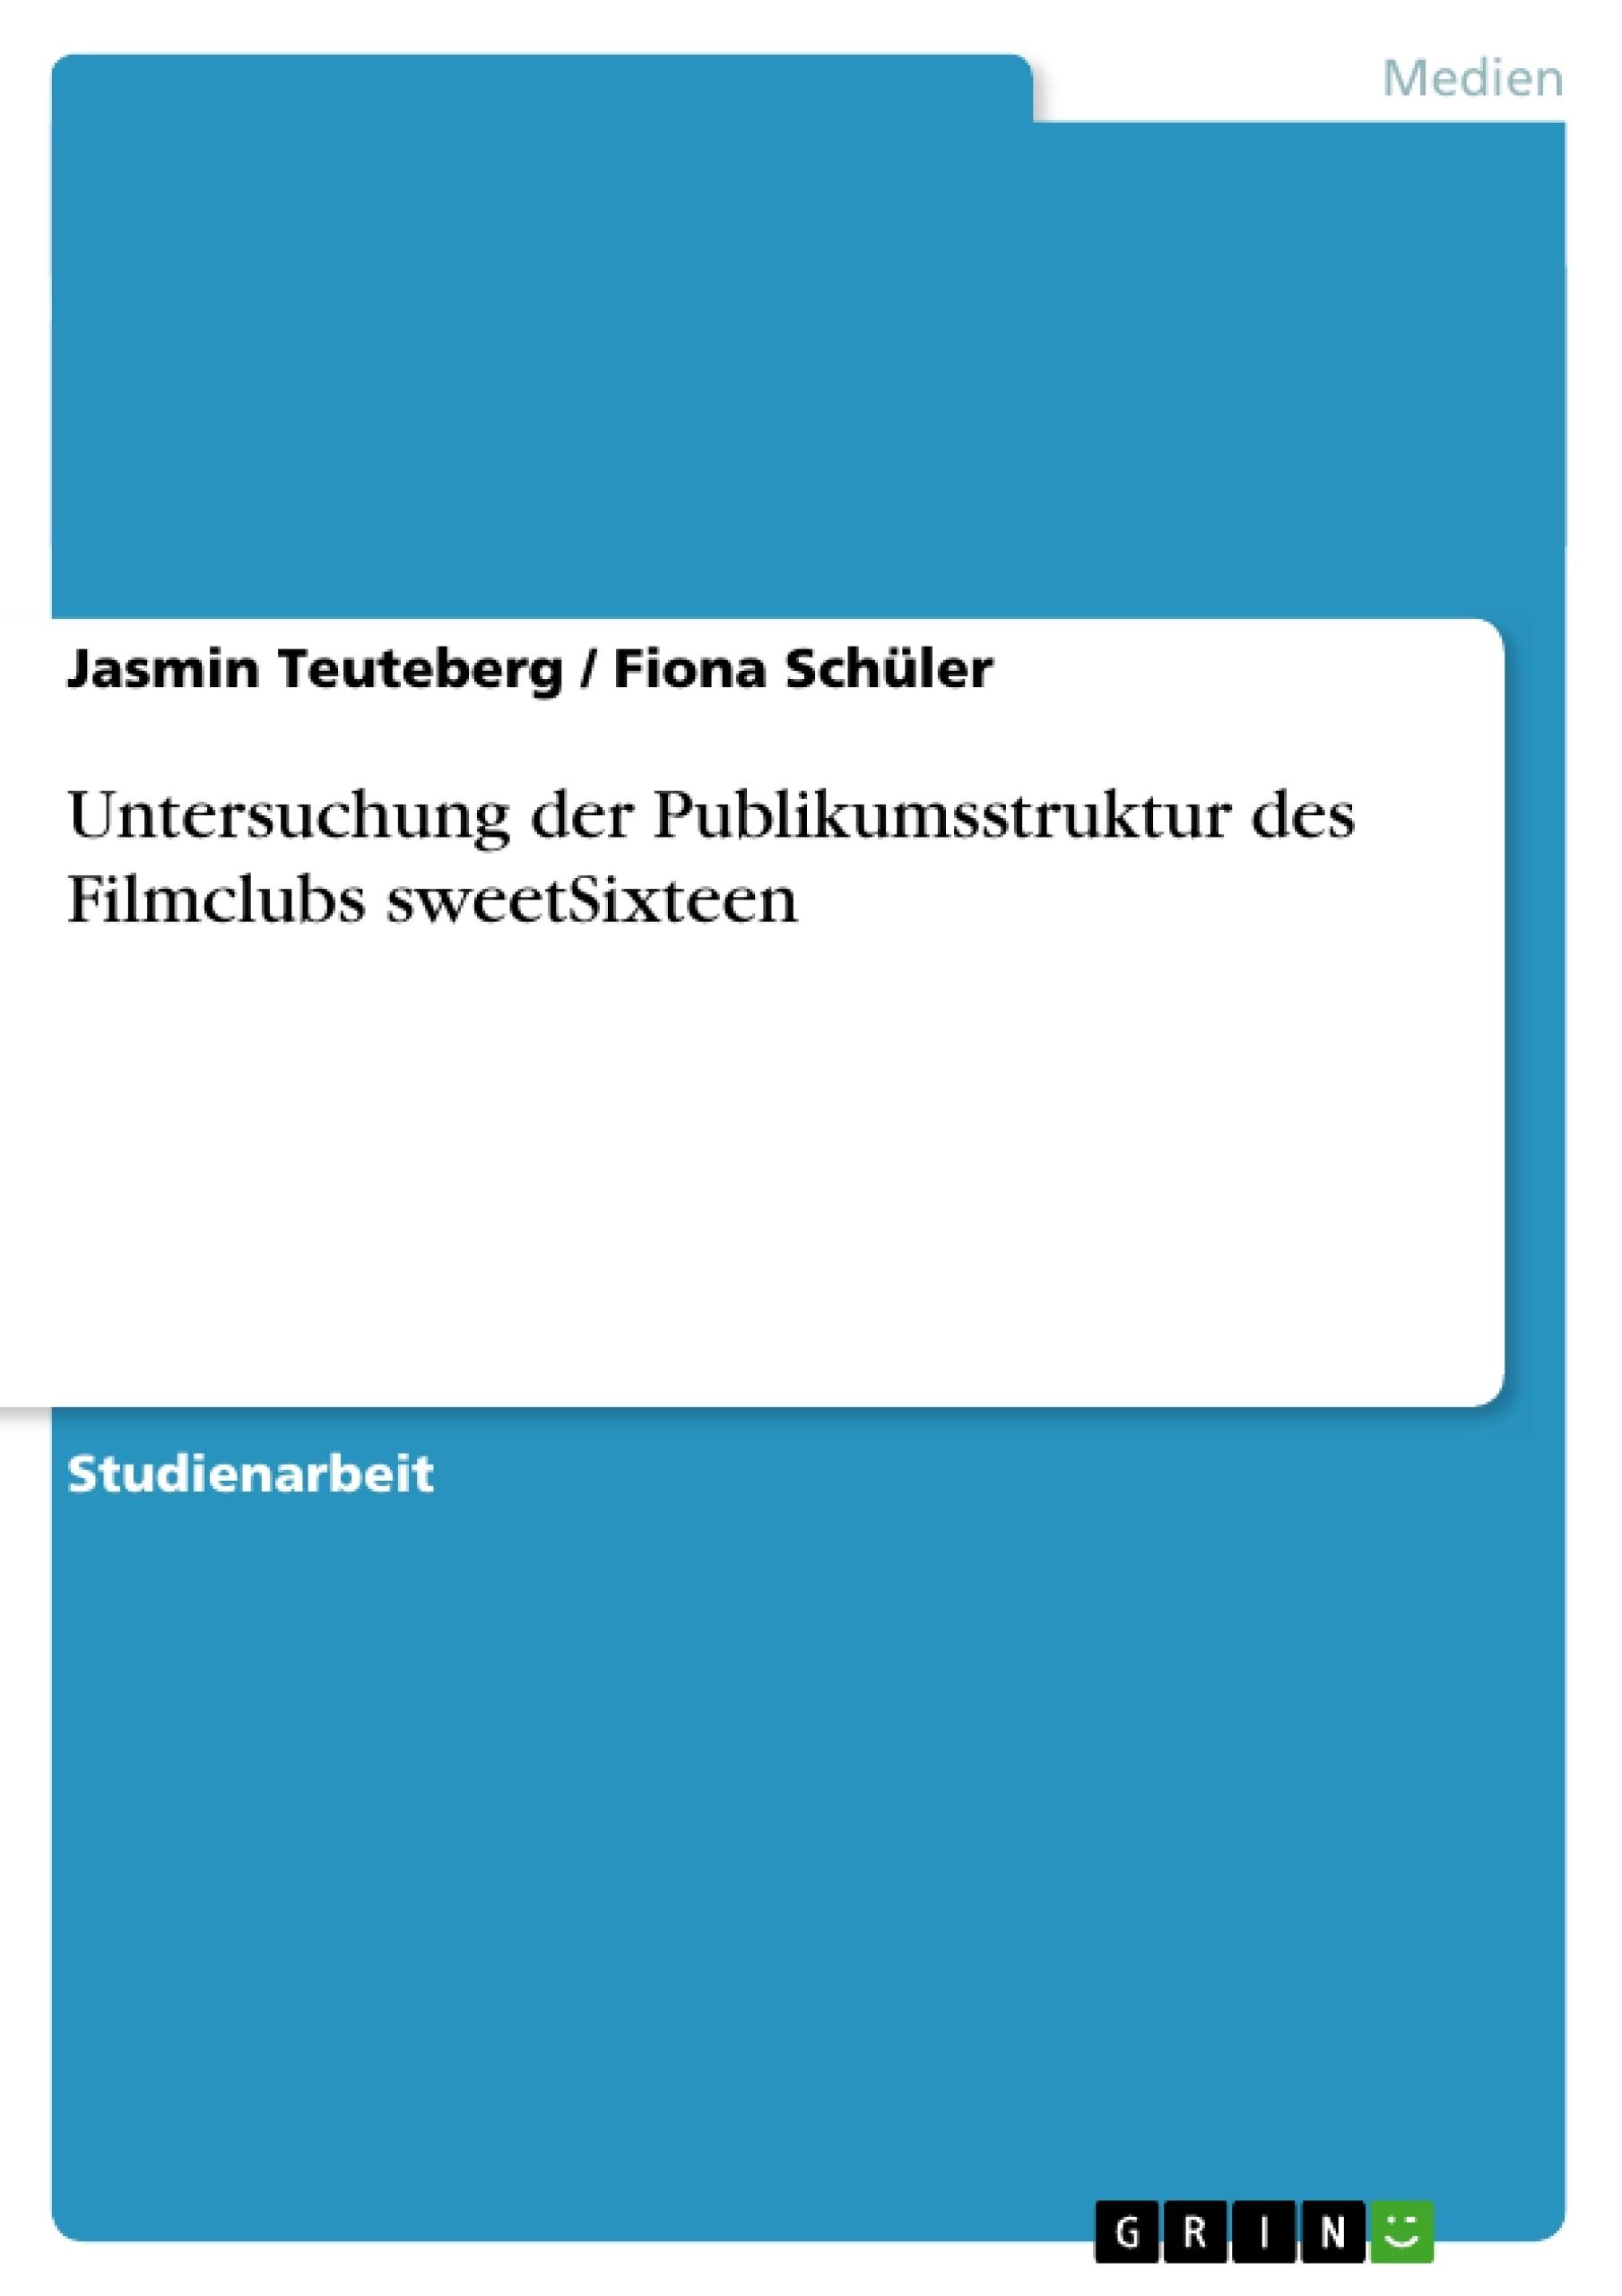 Titel: Untersuchung der Publikumsstruktur des Filmclubs sweetSixteen